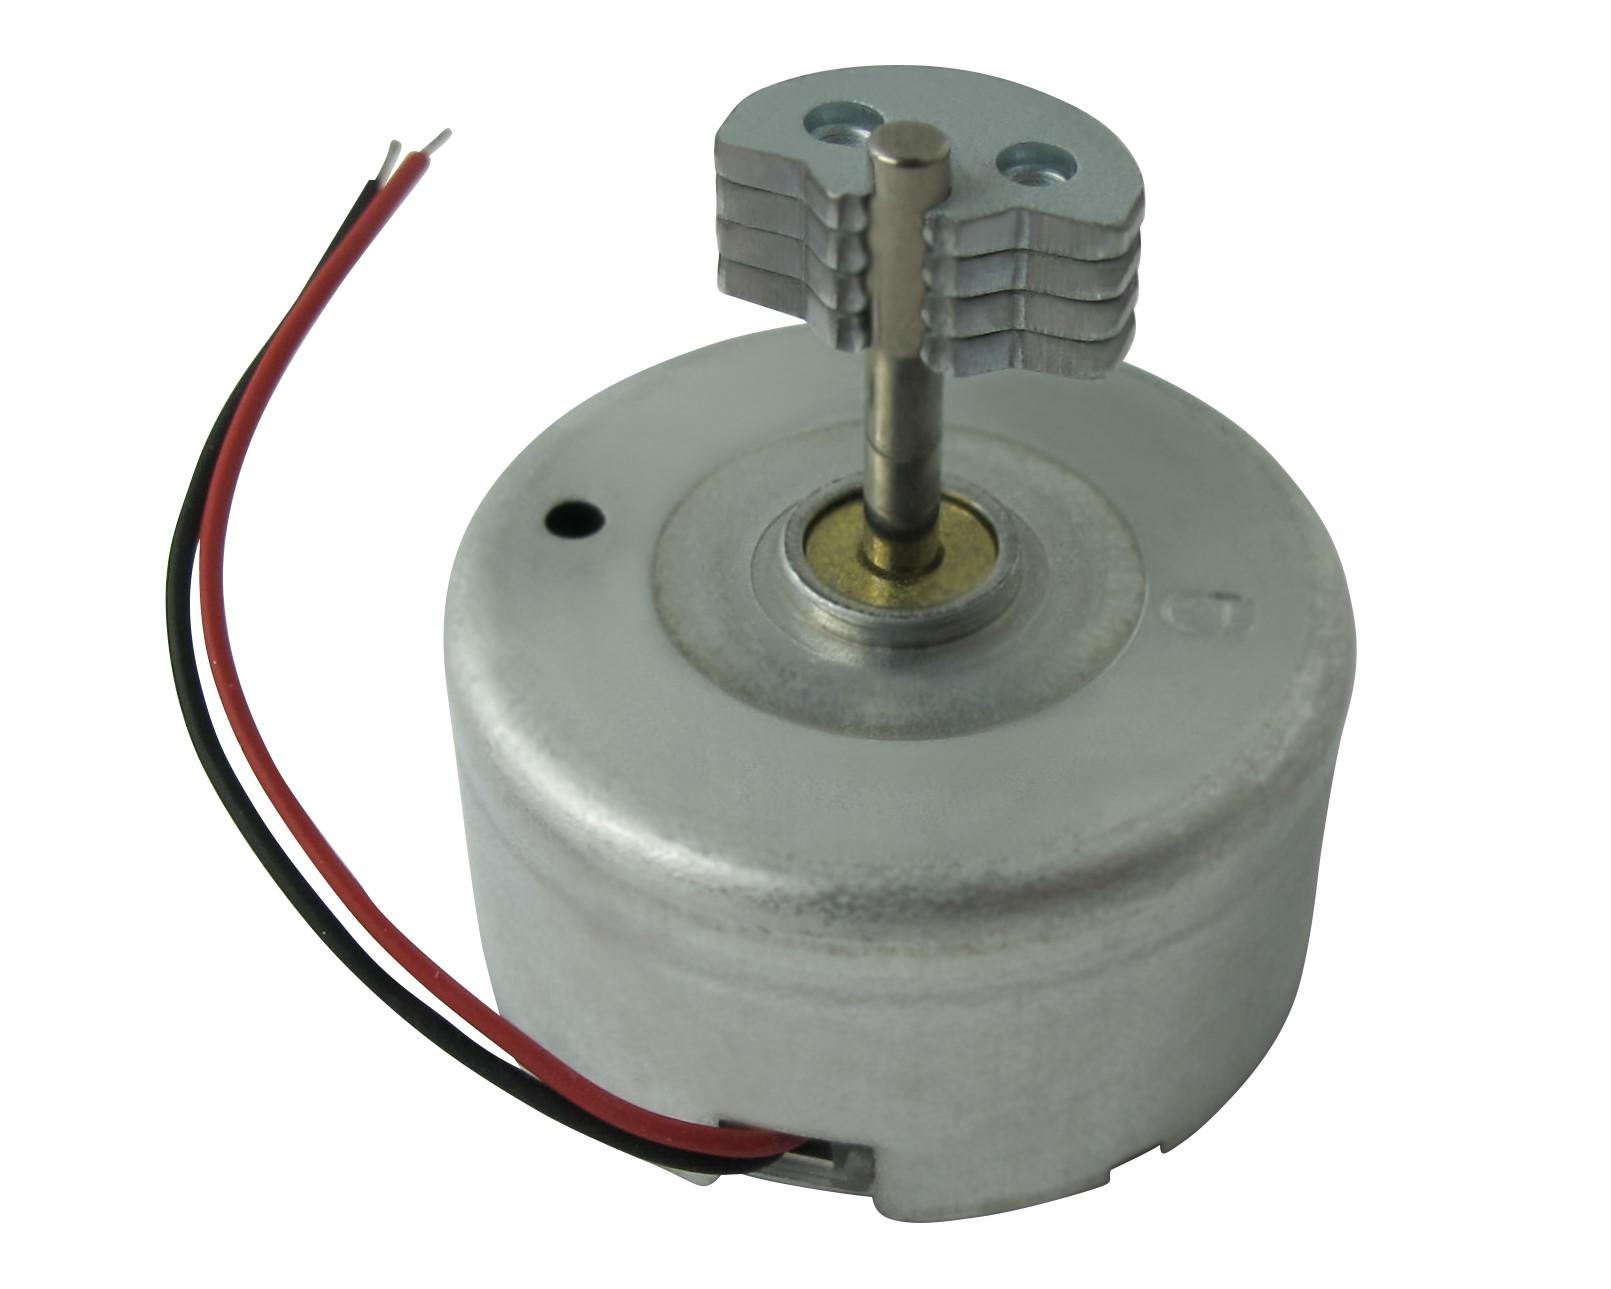 JQ24-35E400C Cylindrical Vibrator Motor